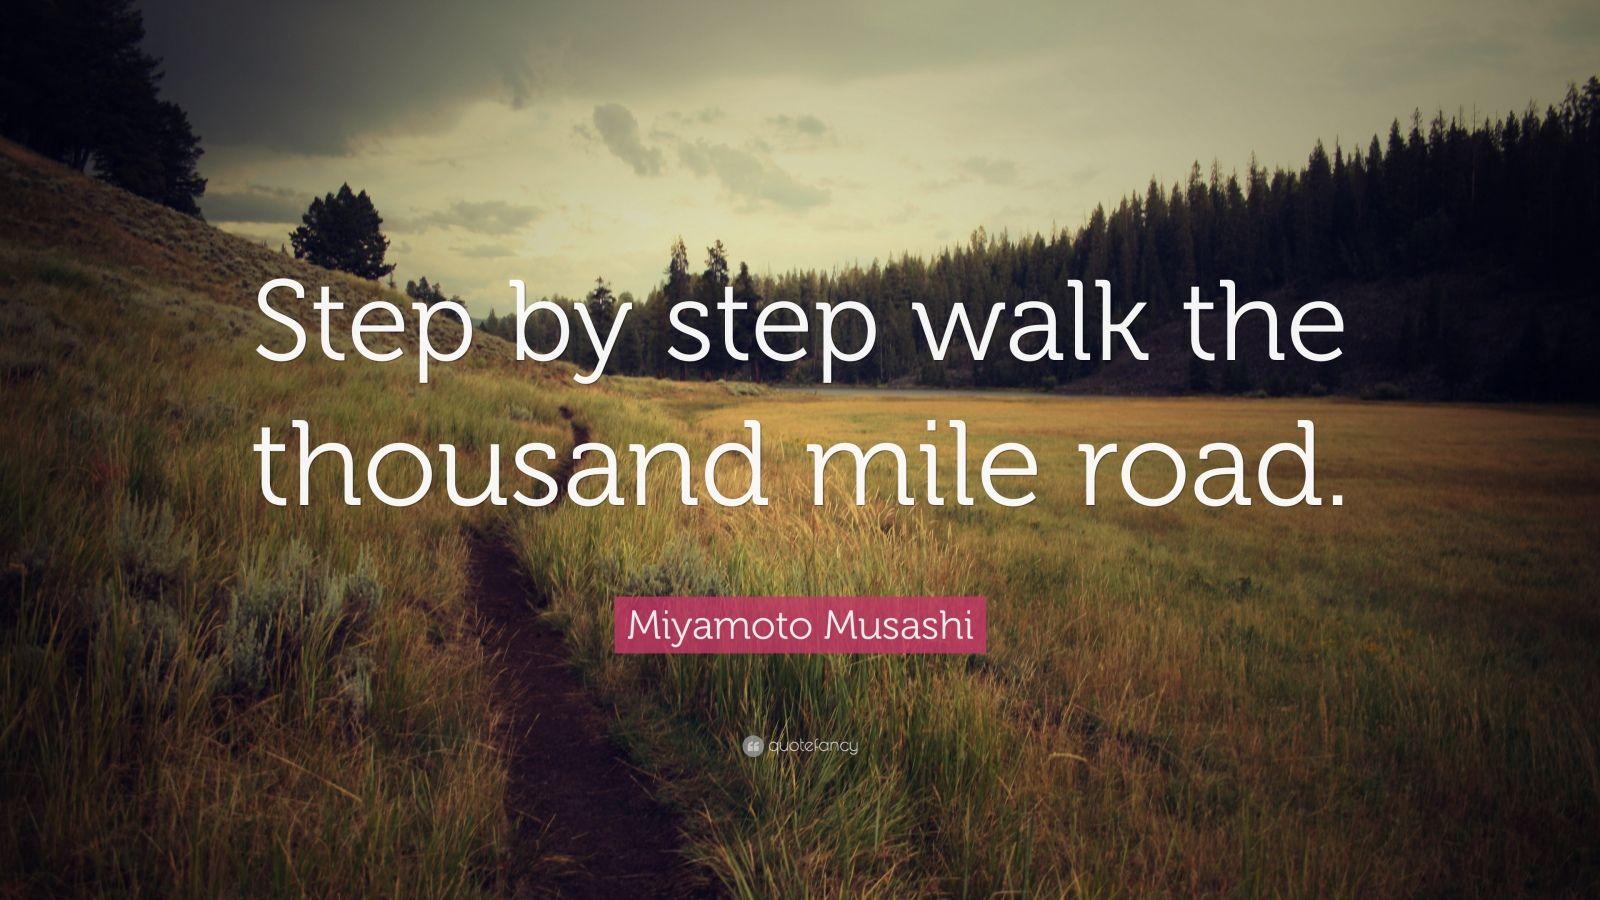 Jiu Jitsu Wallpaper Hd Miyamoto Musashi Quotes 100 Wallpapers Quotefancy